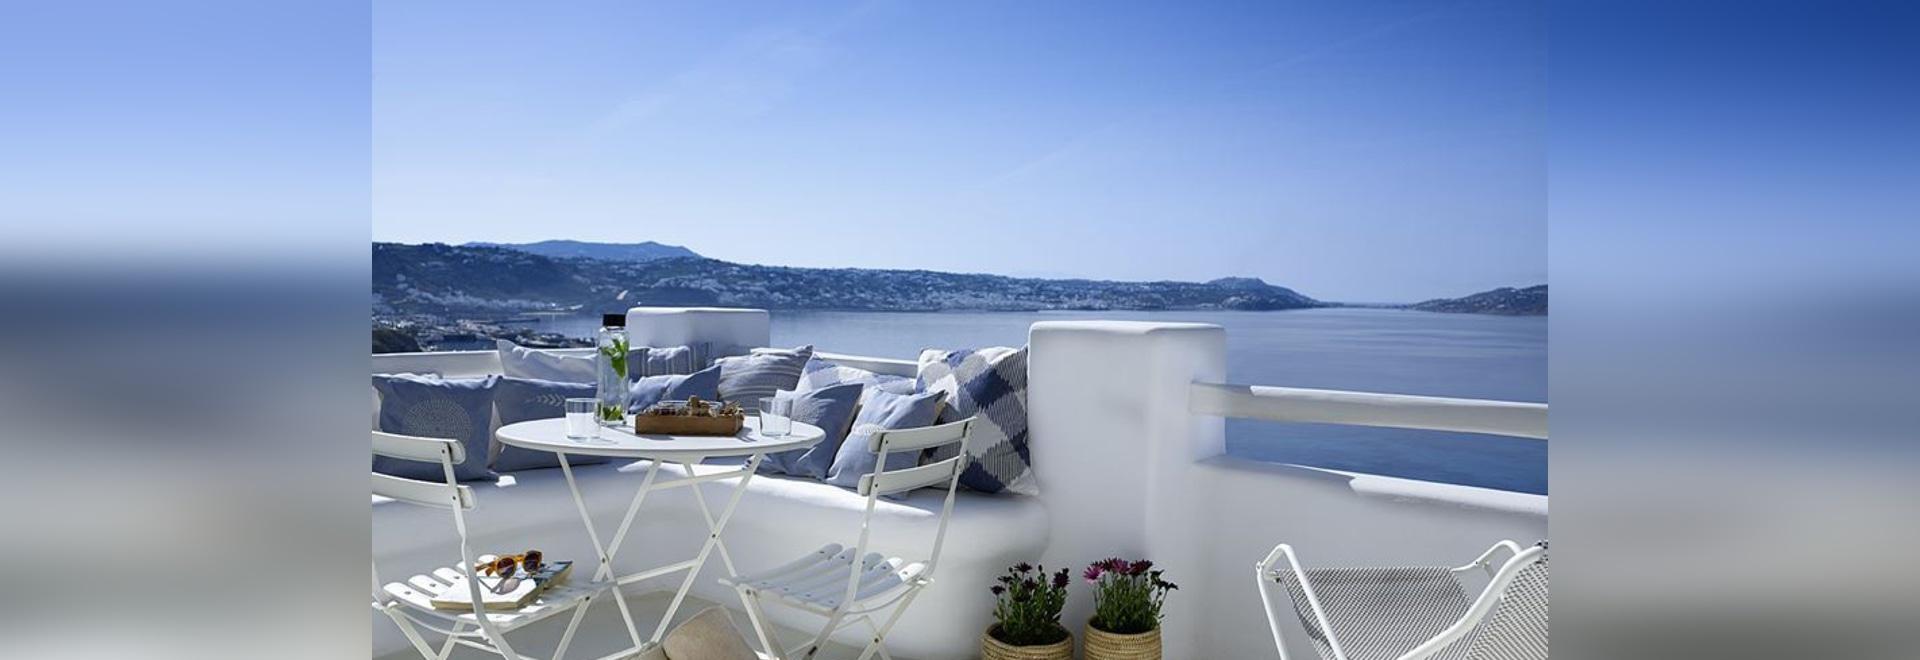 Grand Rocabella Mykonos Art Hotel U0026 SPA